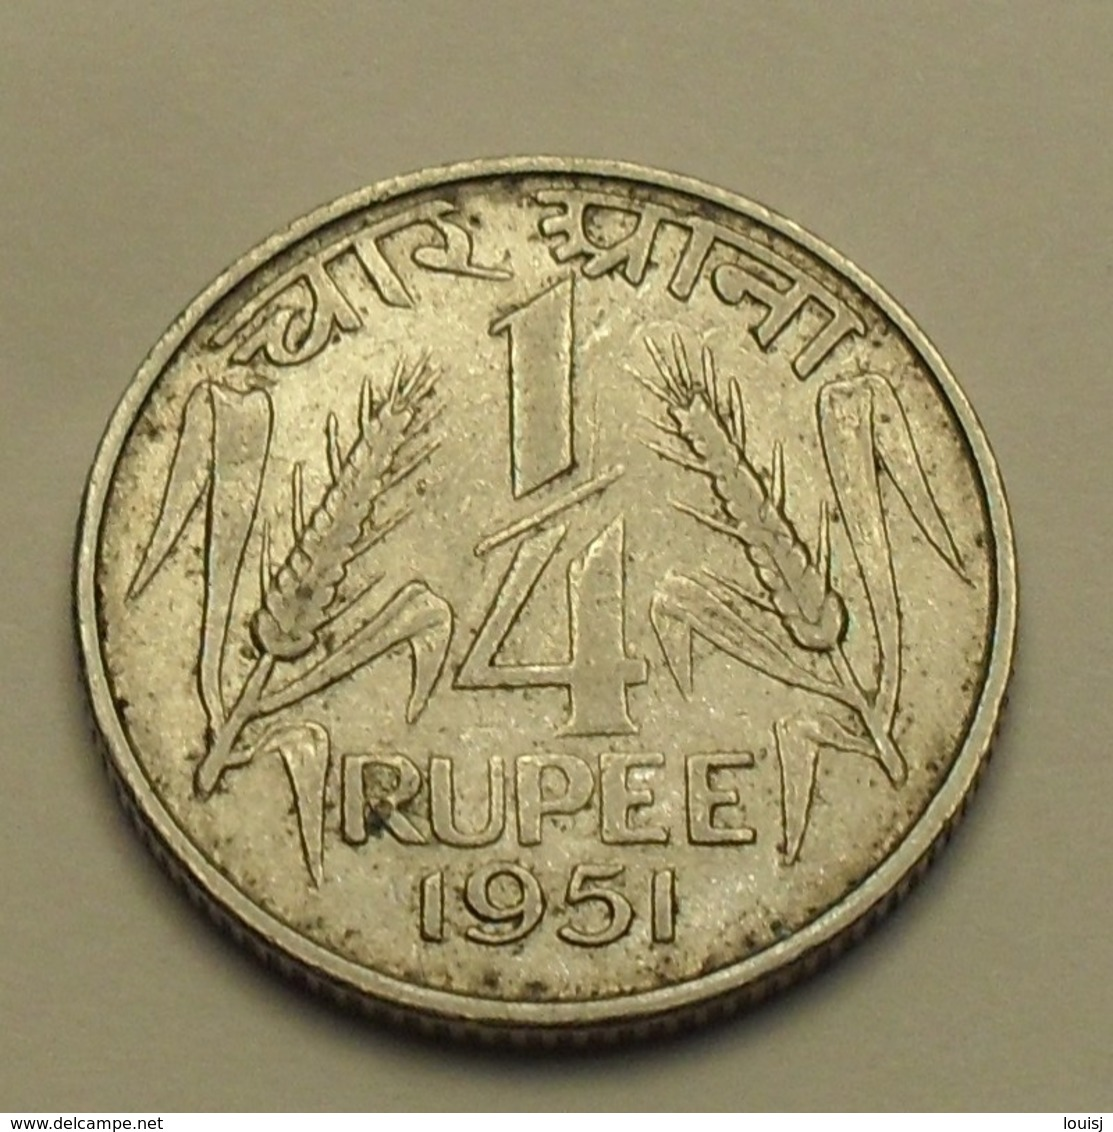 1951 - Inde République - India Republic - 1/4 RUPEE - KM 5.1 - Inde